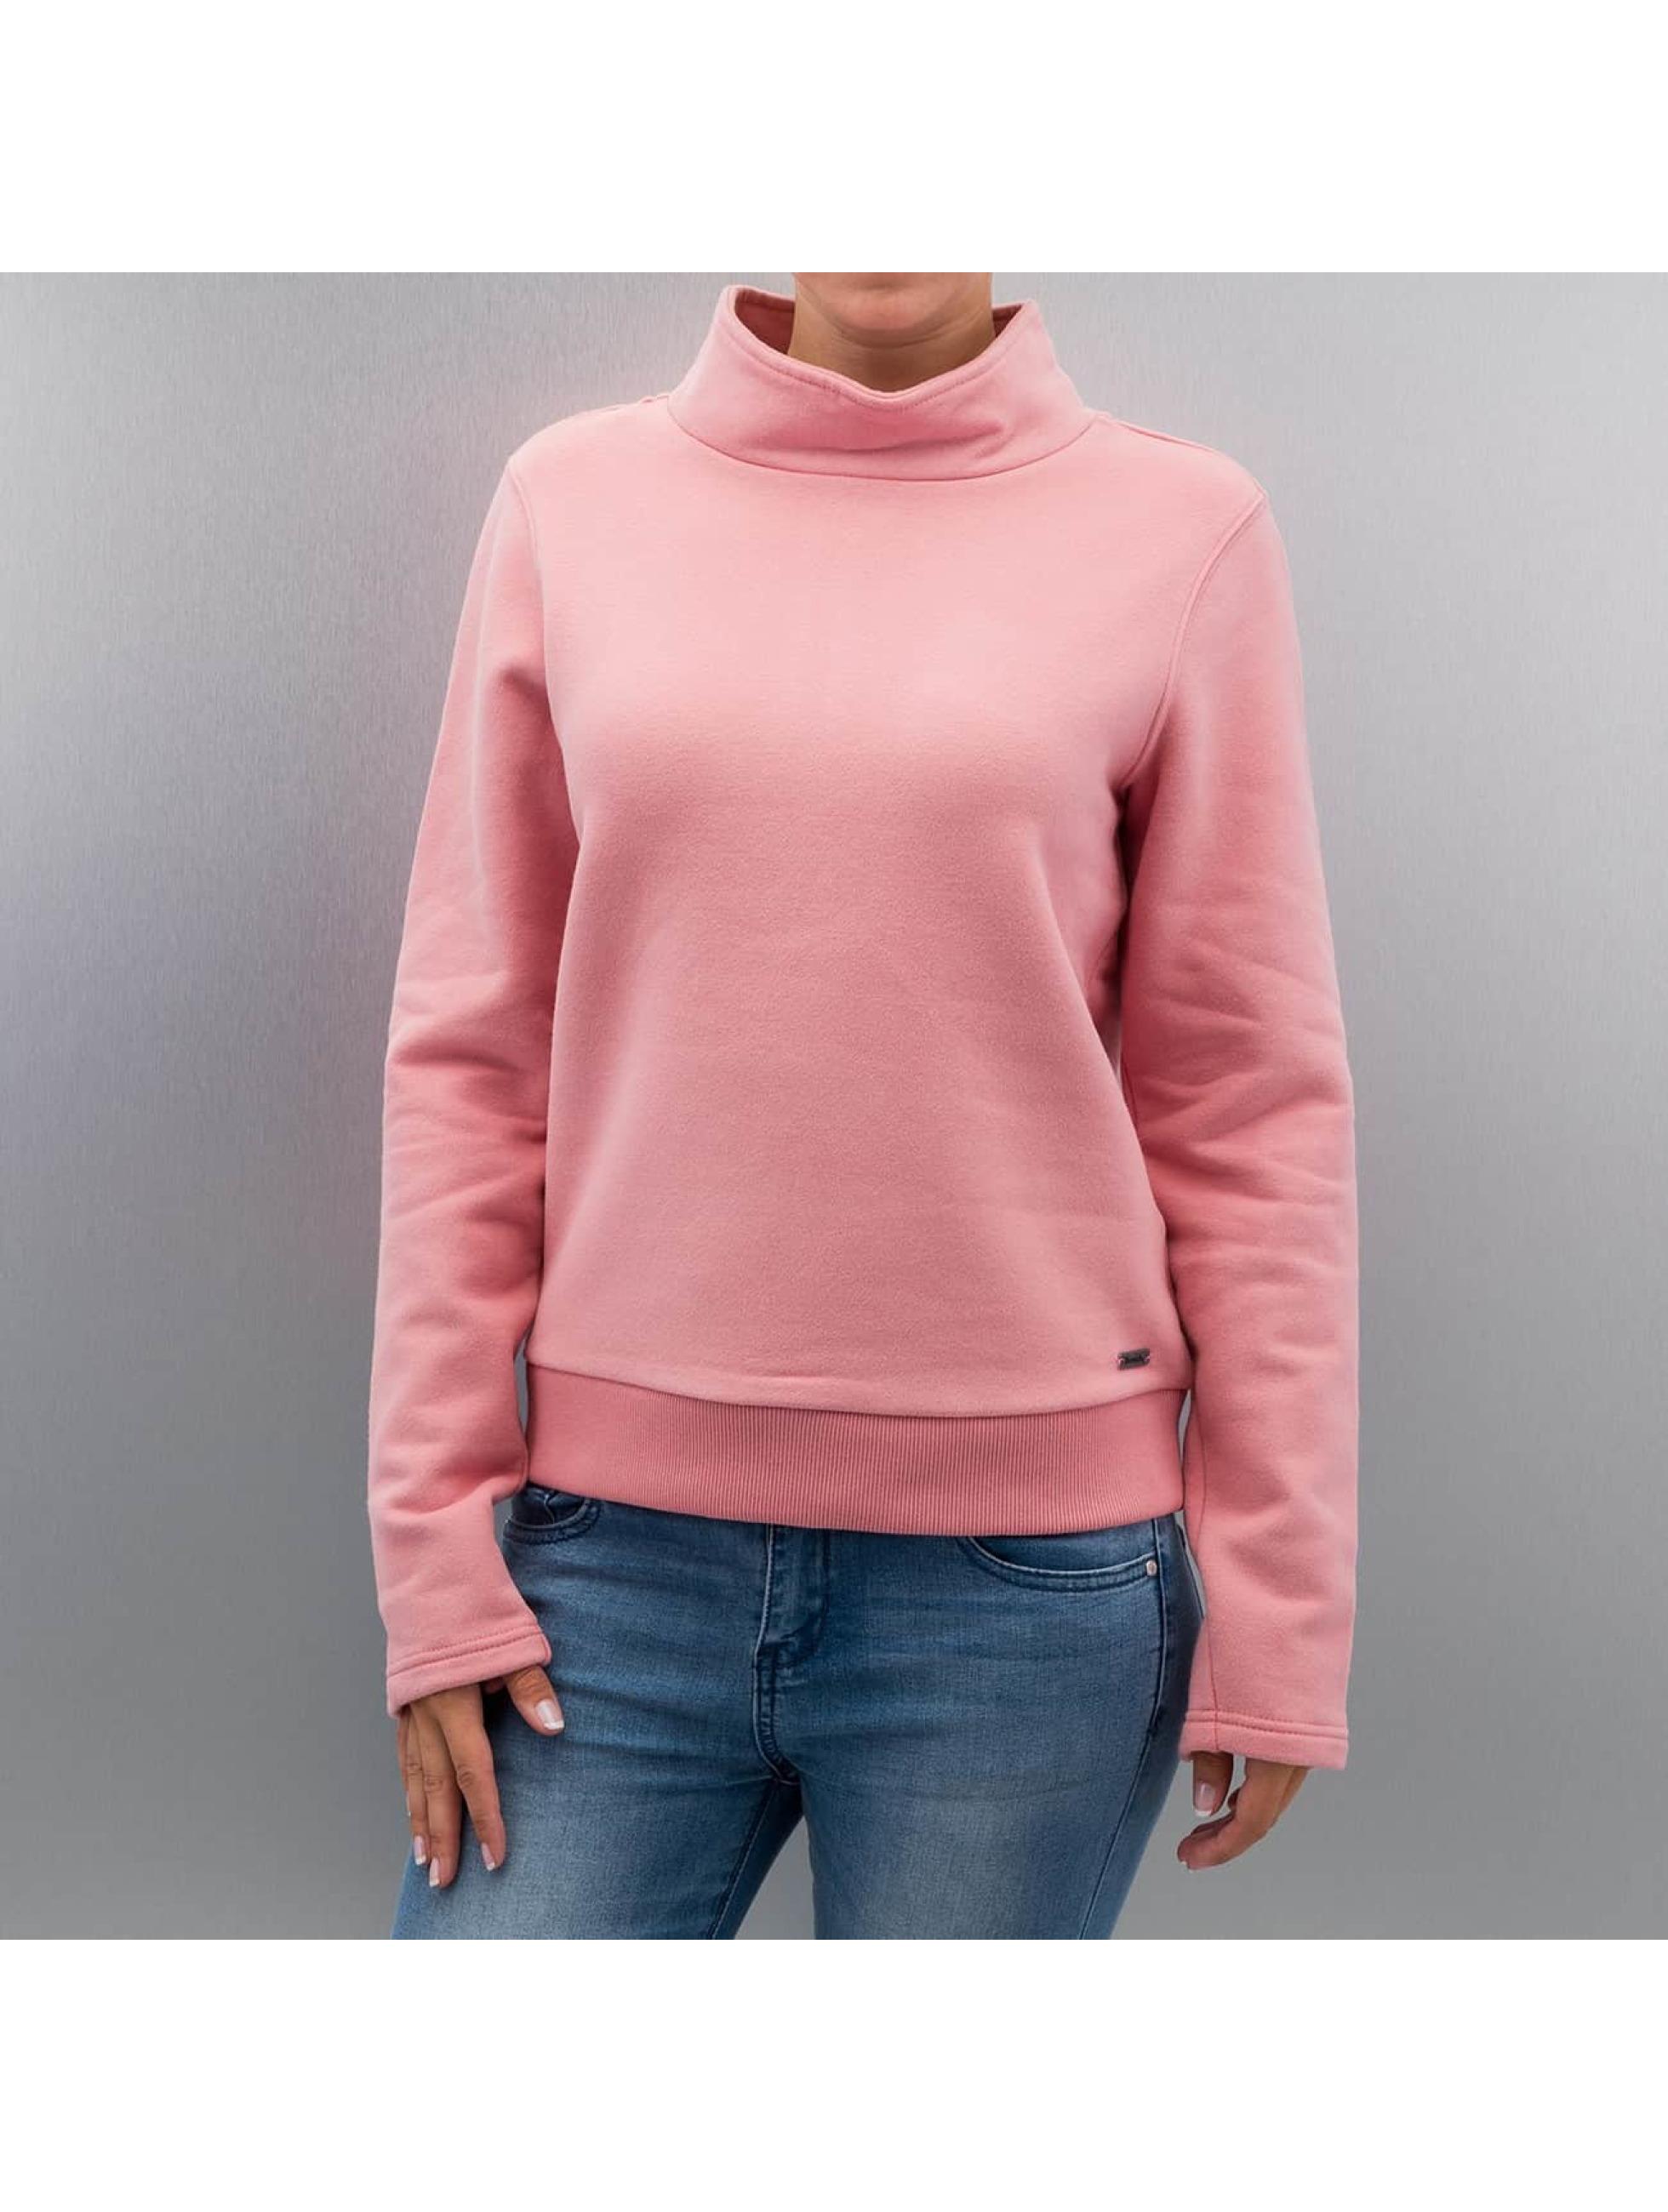 Bench Haut / Pullover Repay en rose